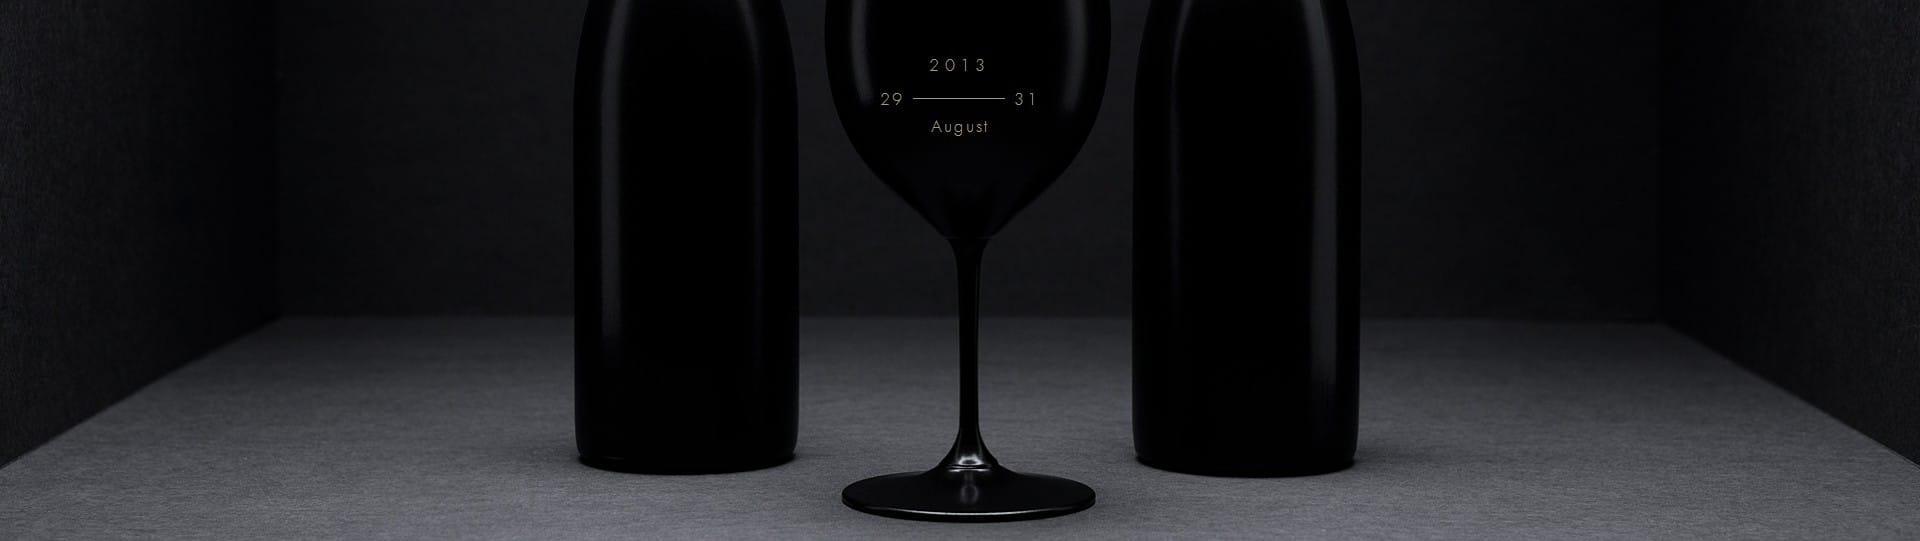 Bergen vinfest 2013